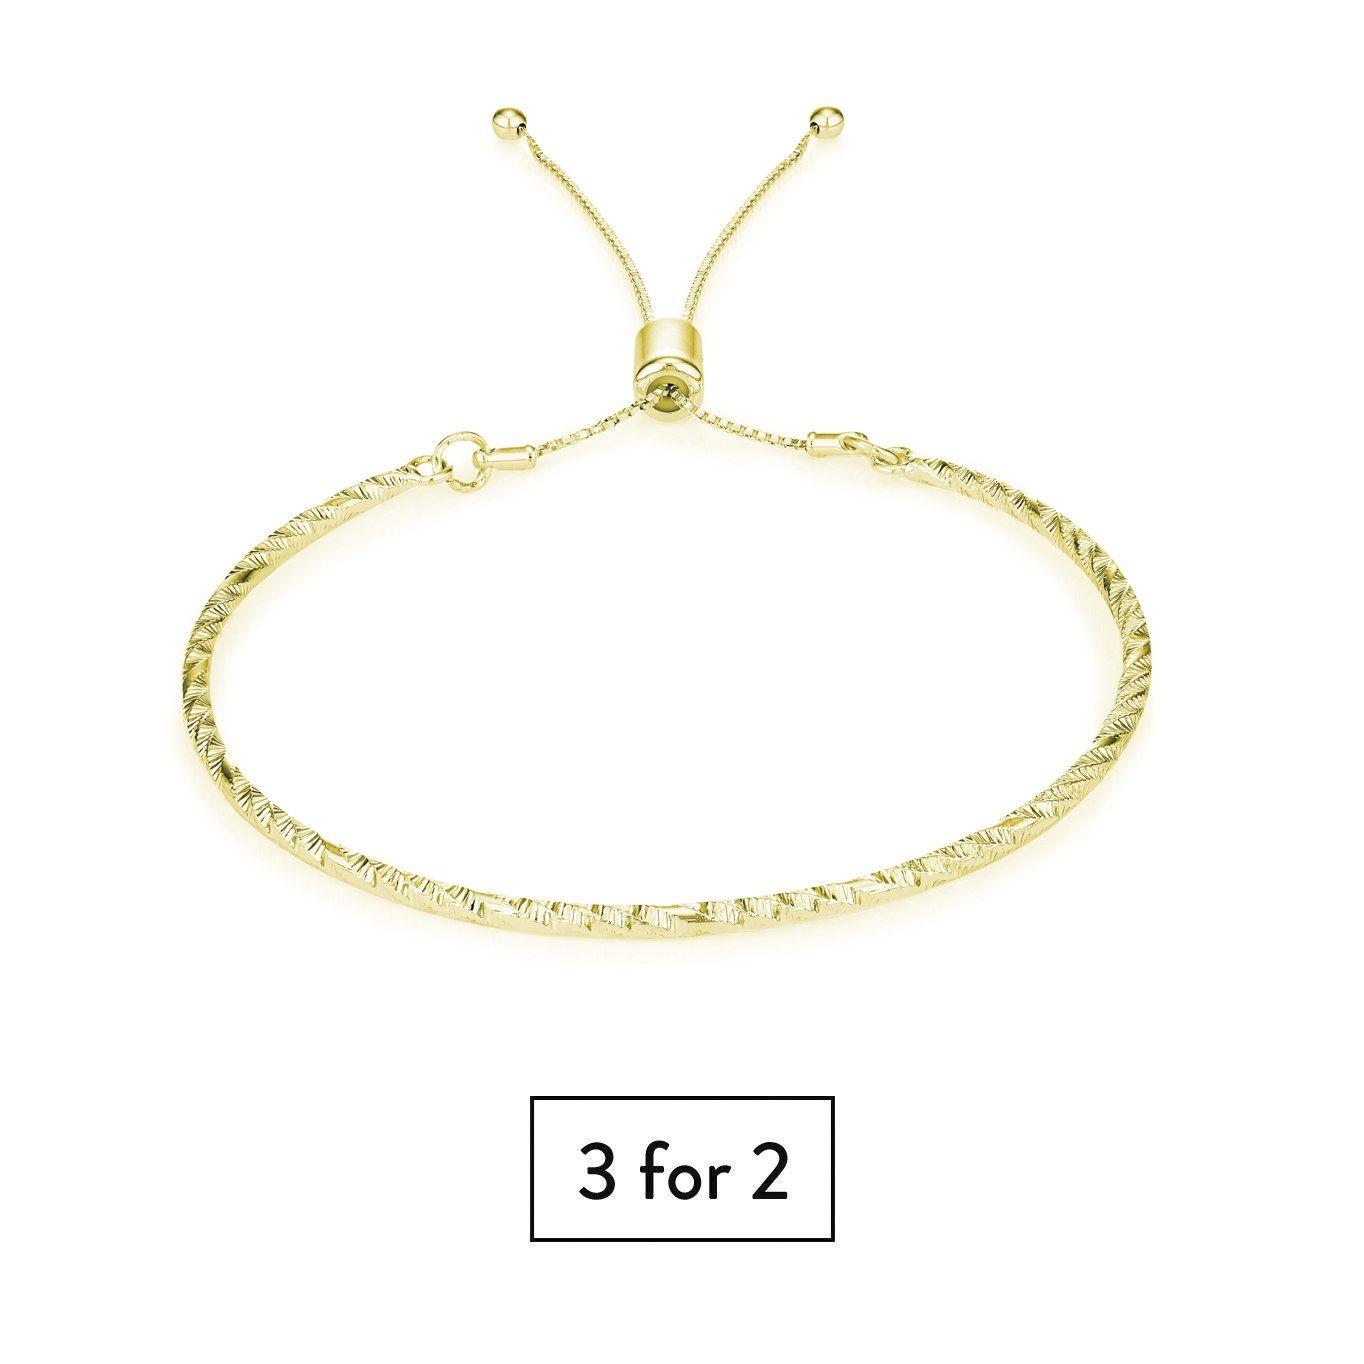 Buckley London Ridley Bracelet - Gold